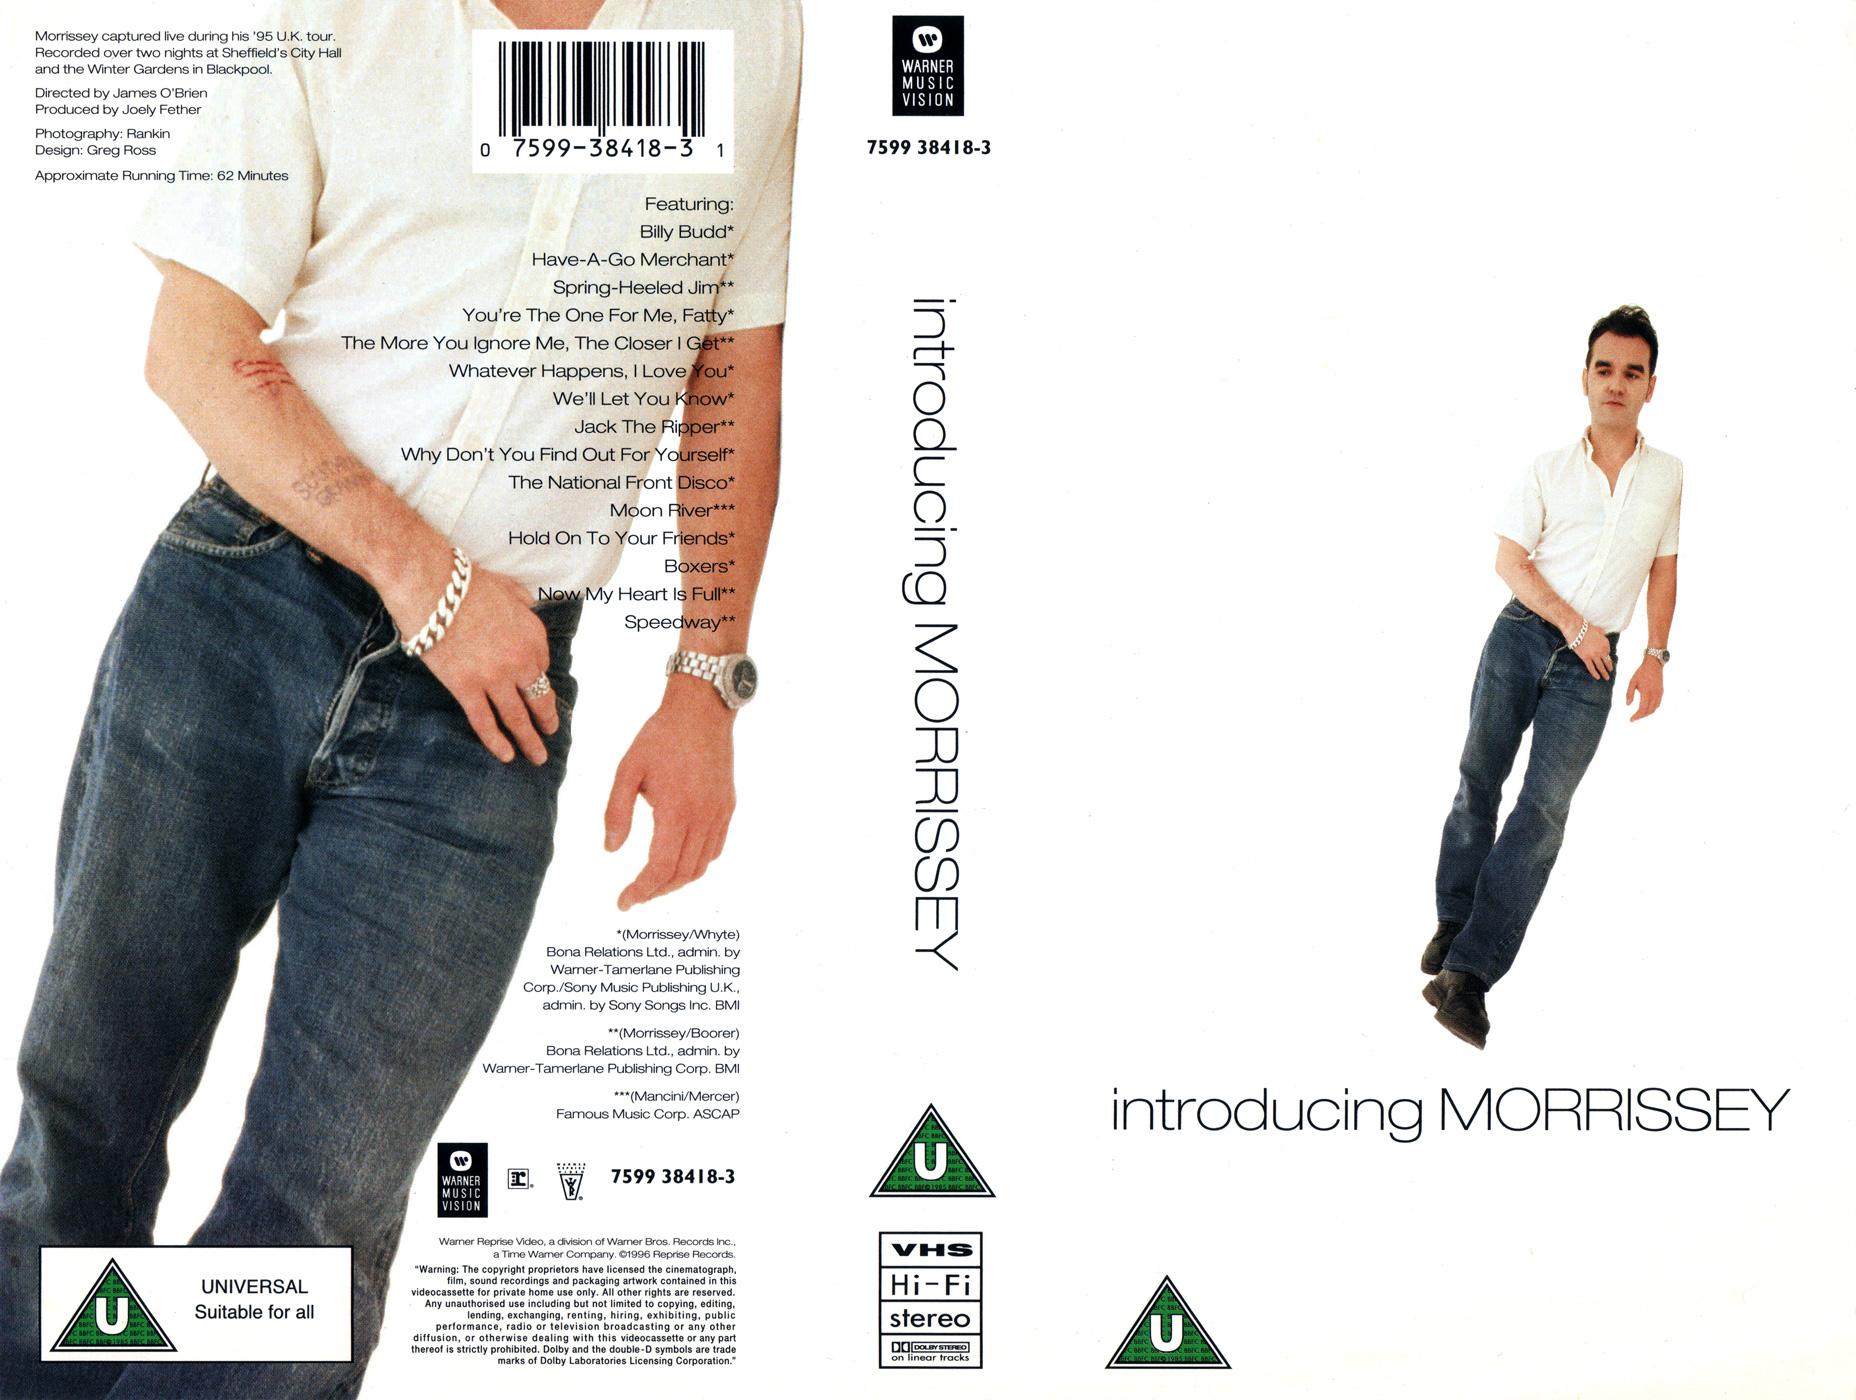 News – Morrissey – Introducing Morrissey